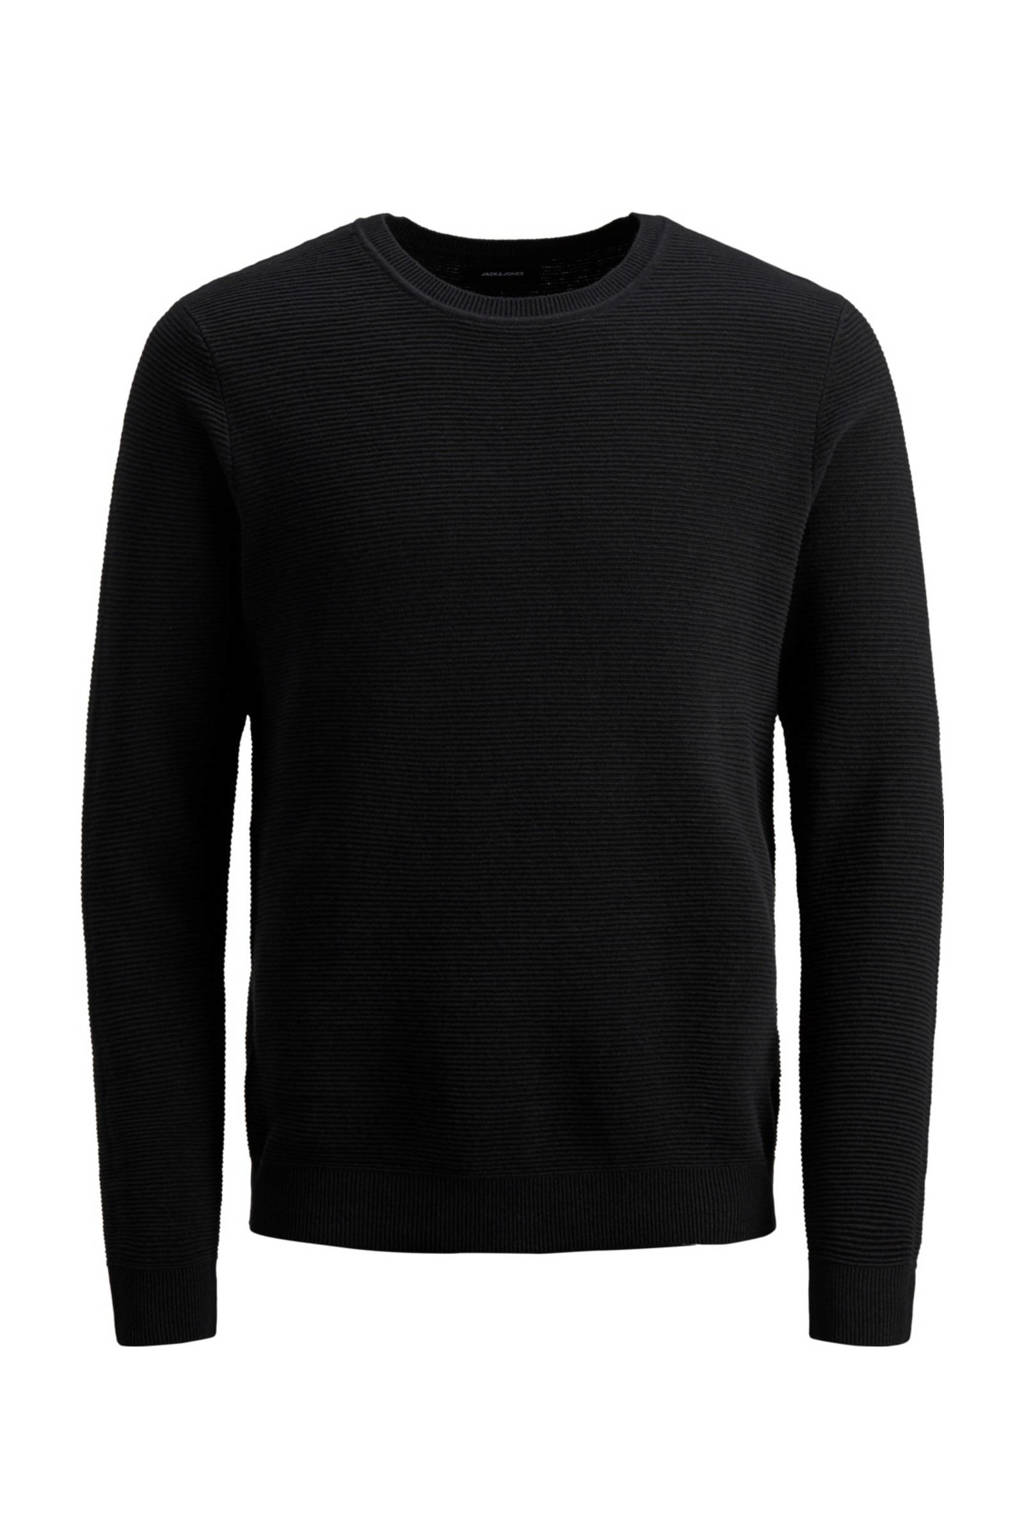 JACK & JONES PLUS SIZE trui zwart, Zwart